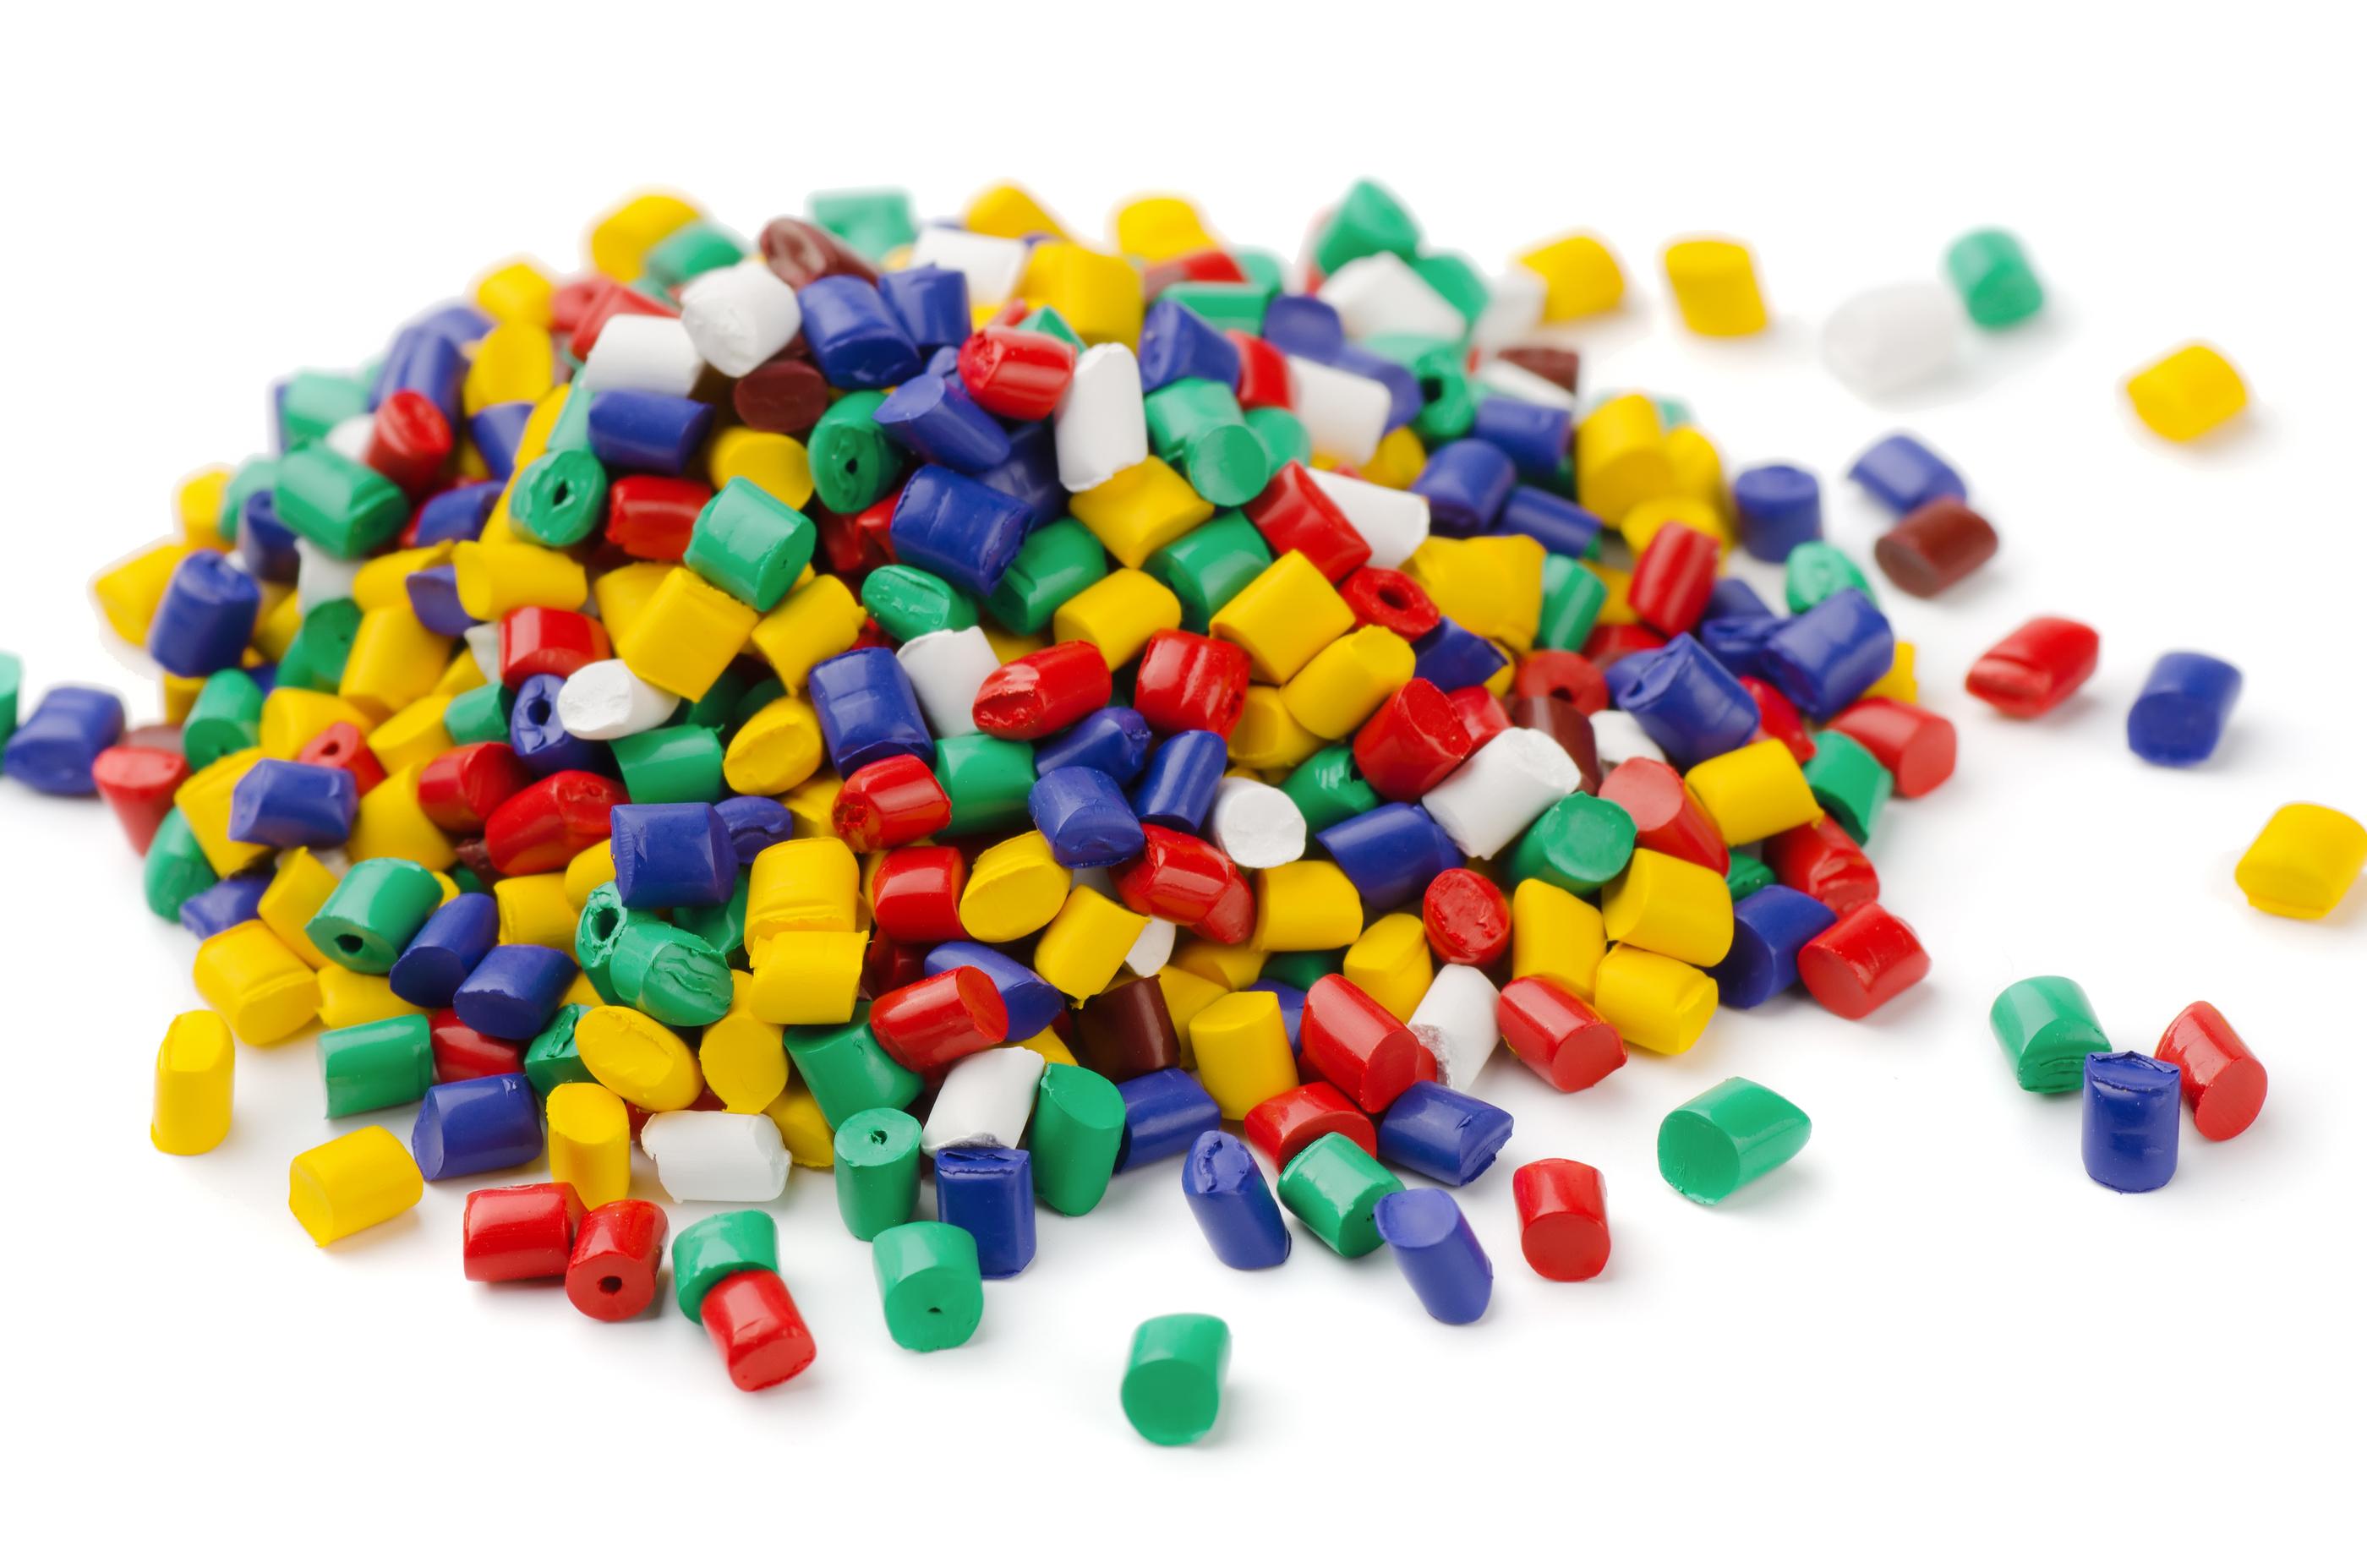 Plastics and Polymers